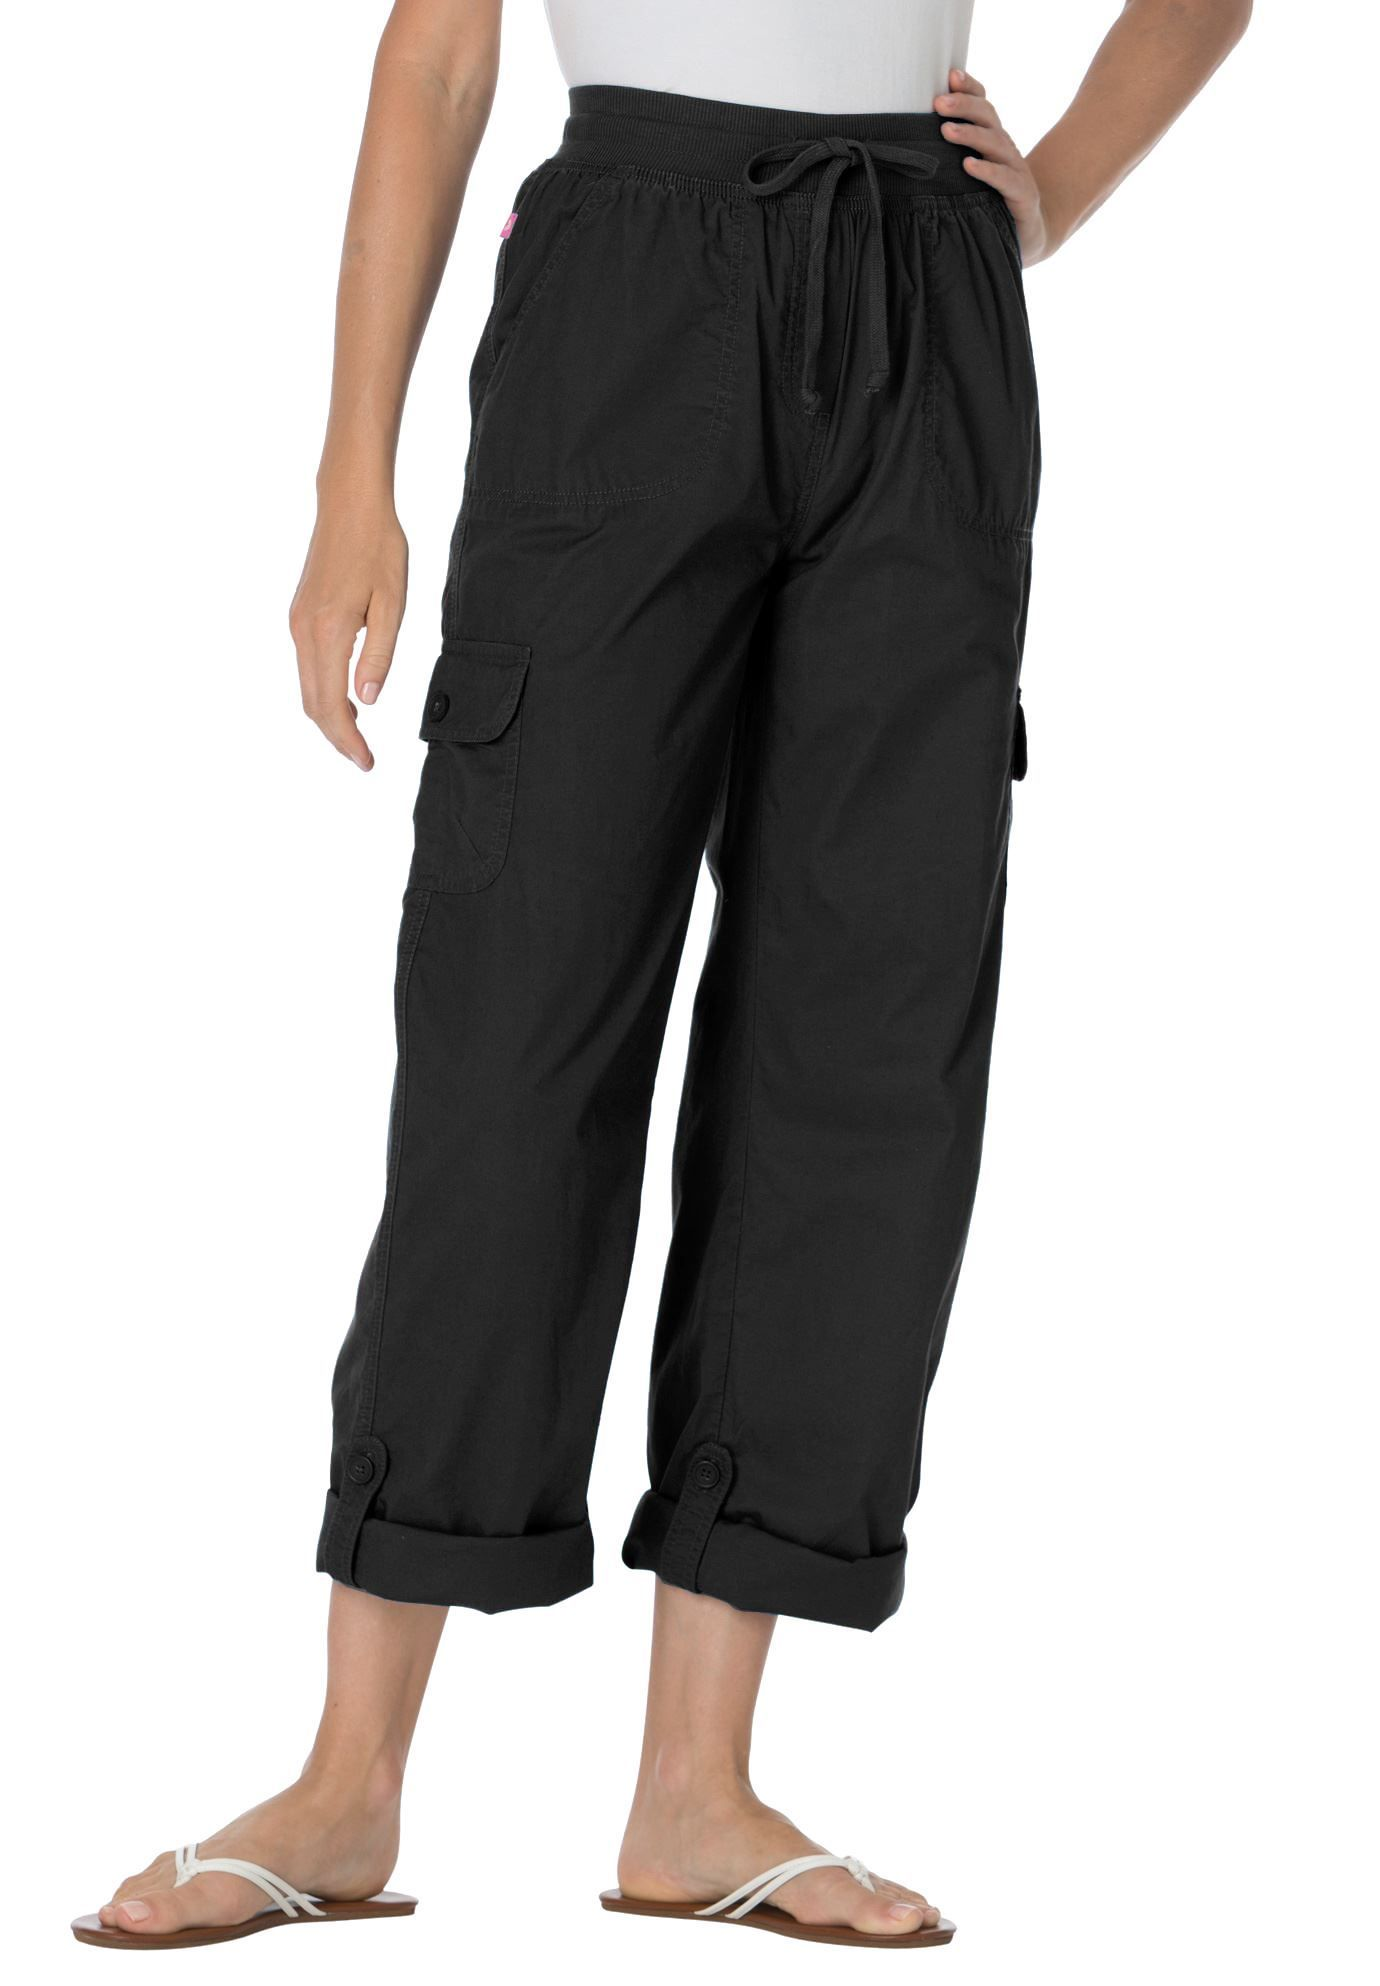 bf2791e4146c0 Petite capri pants in convertible lengths - Women s Plus Size Clothing